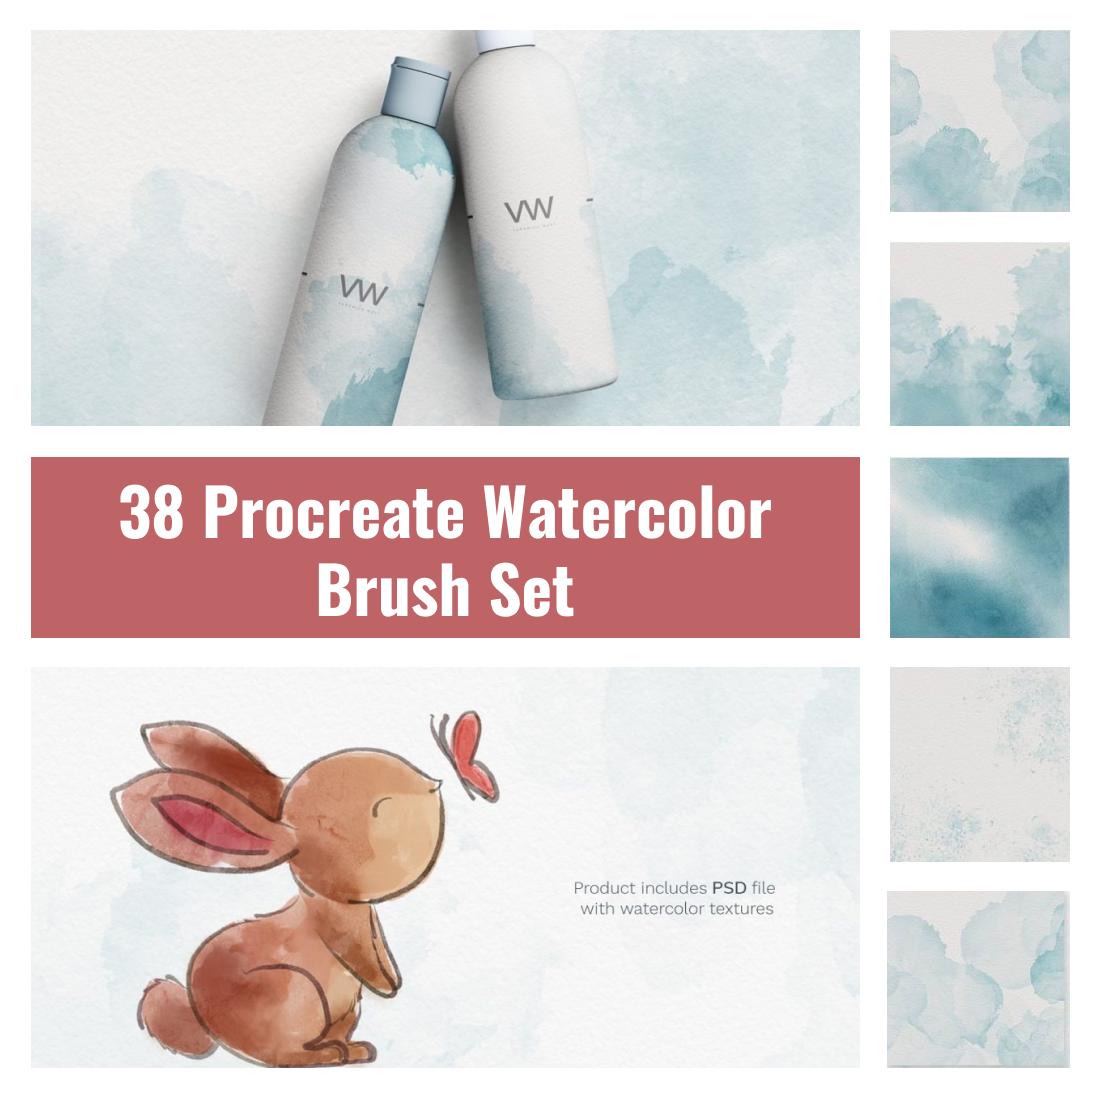 Procreate Watercolor Brush